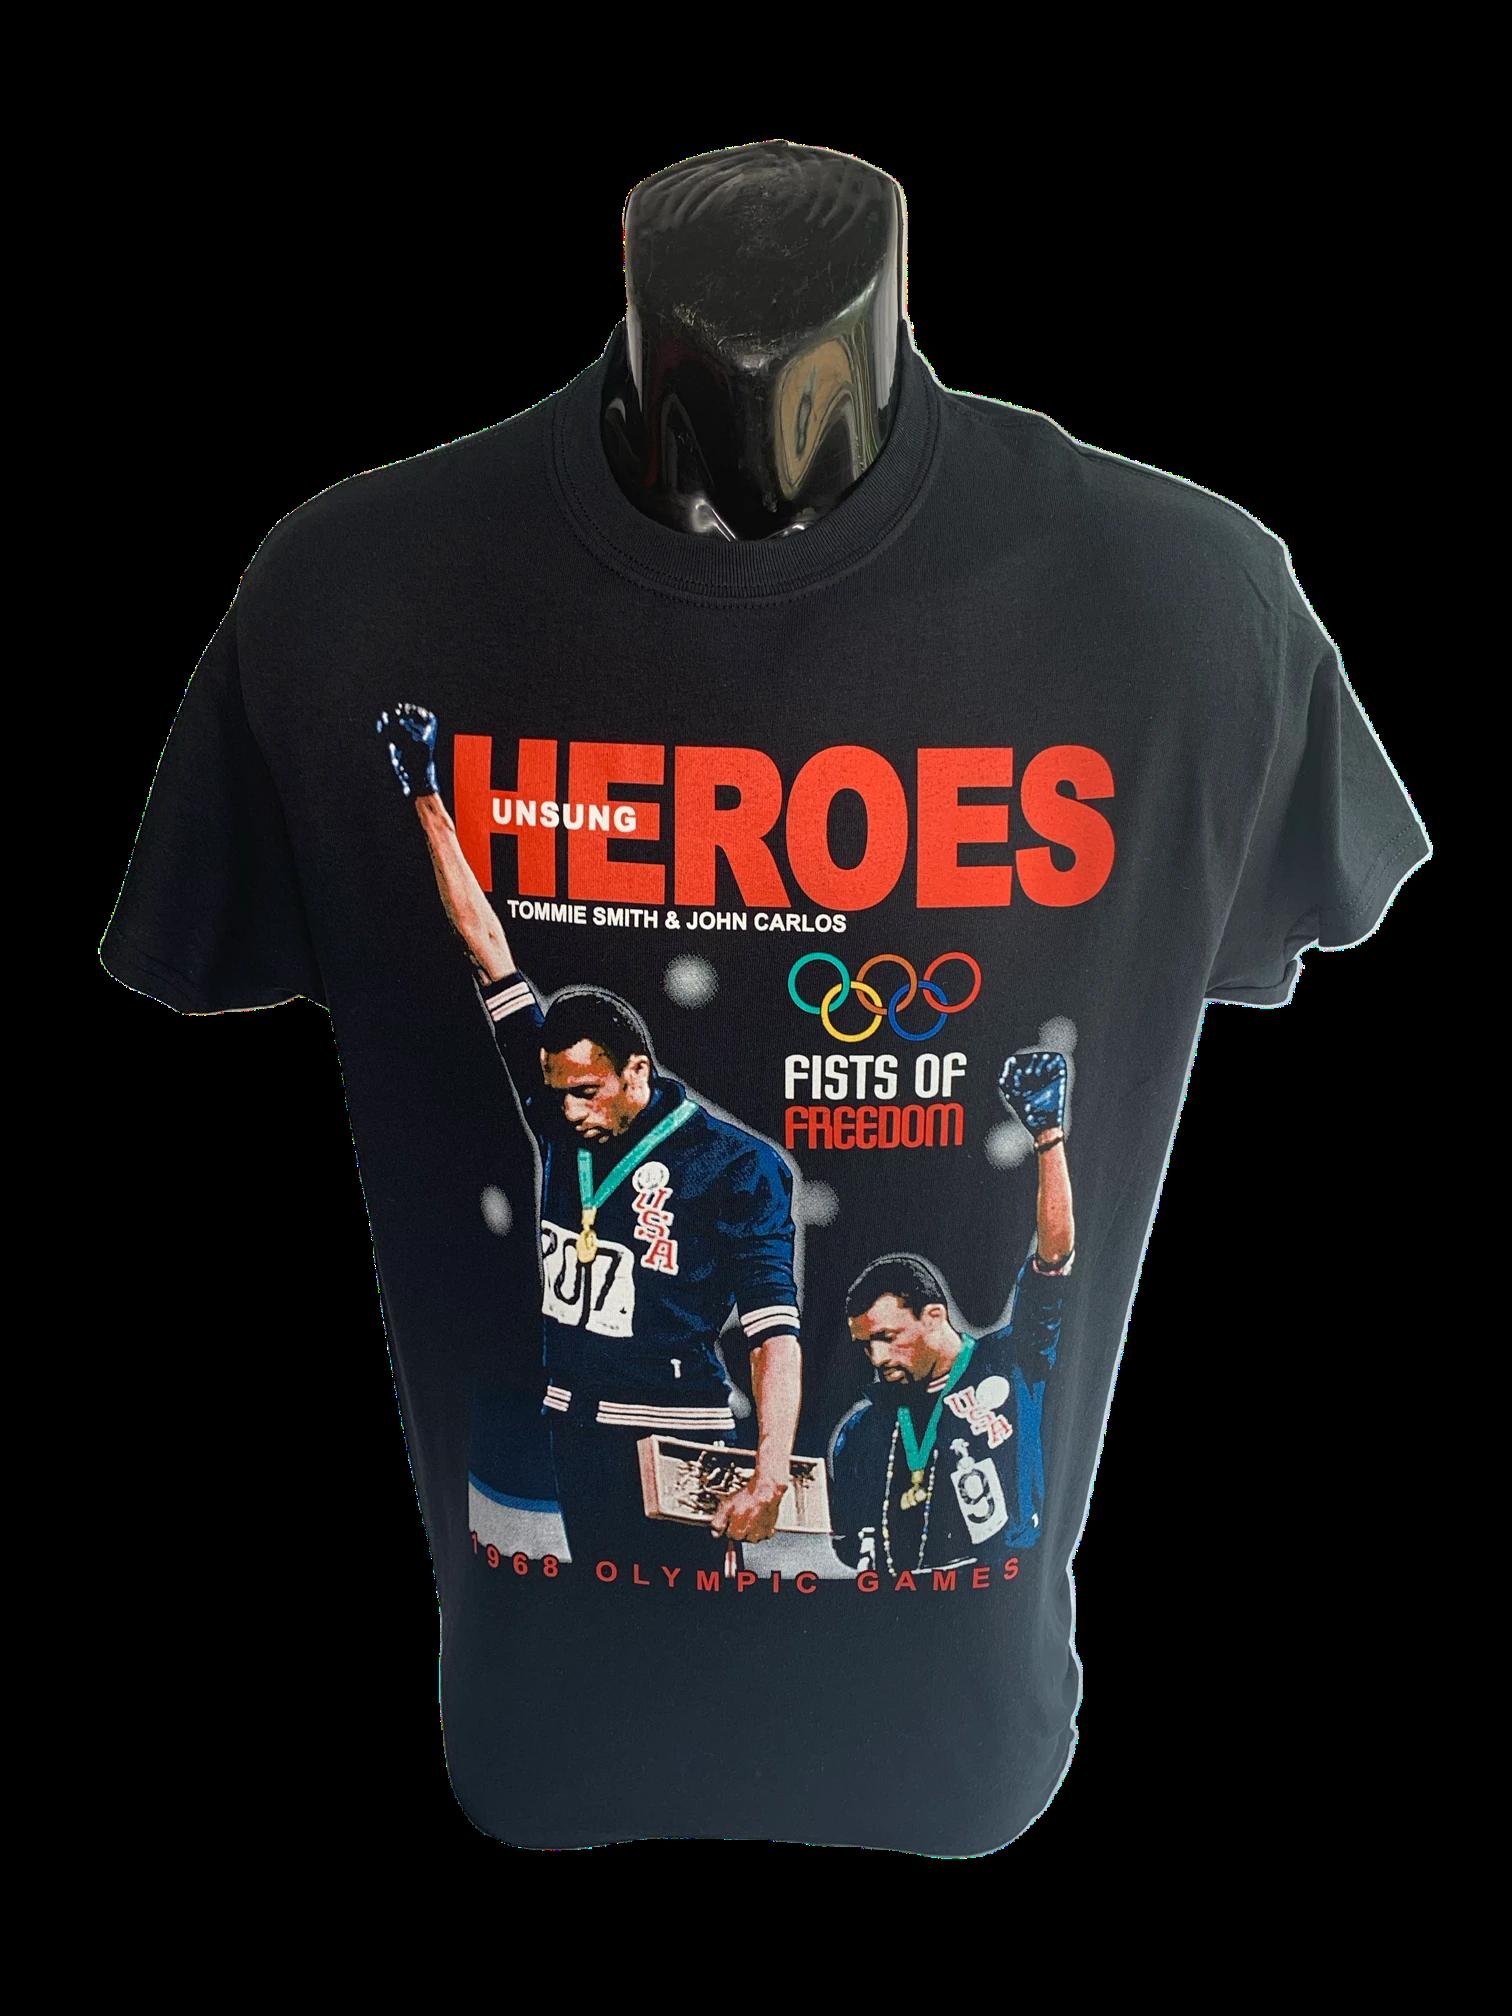 Unsung Heroes T-Shirt